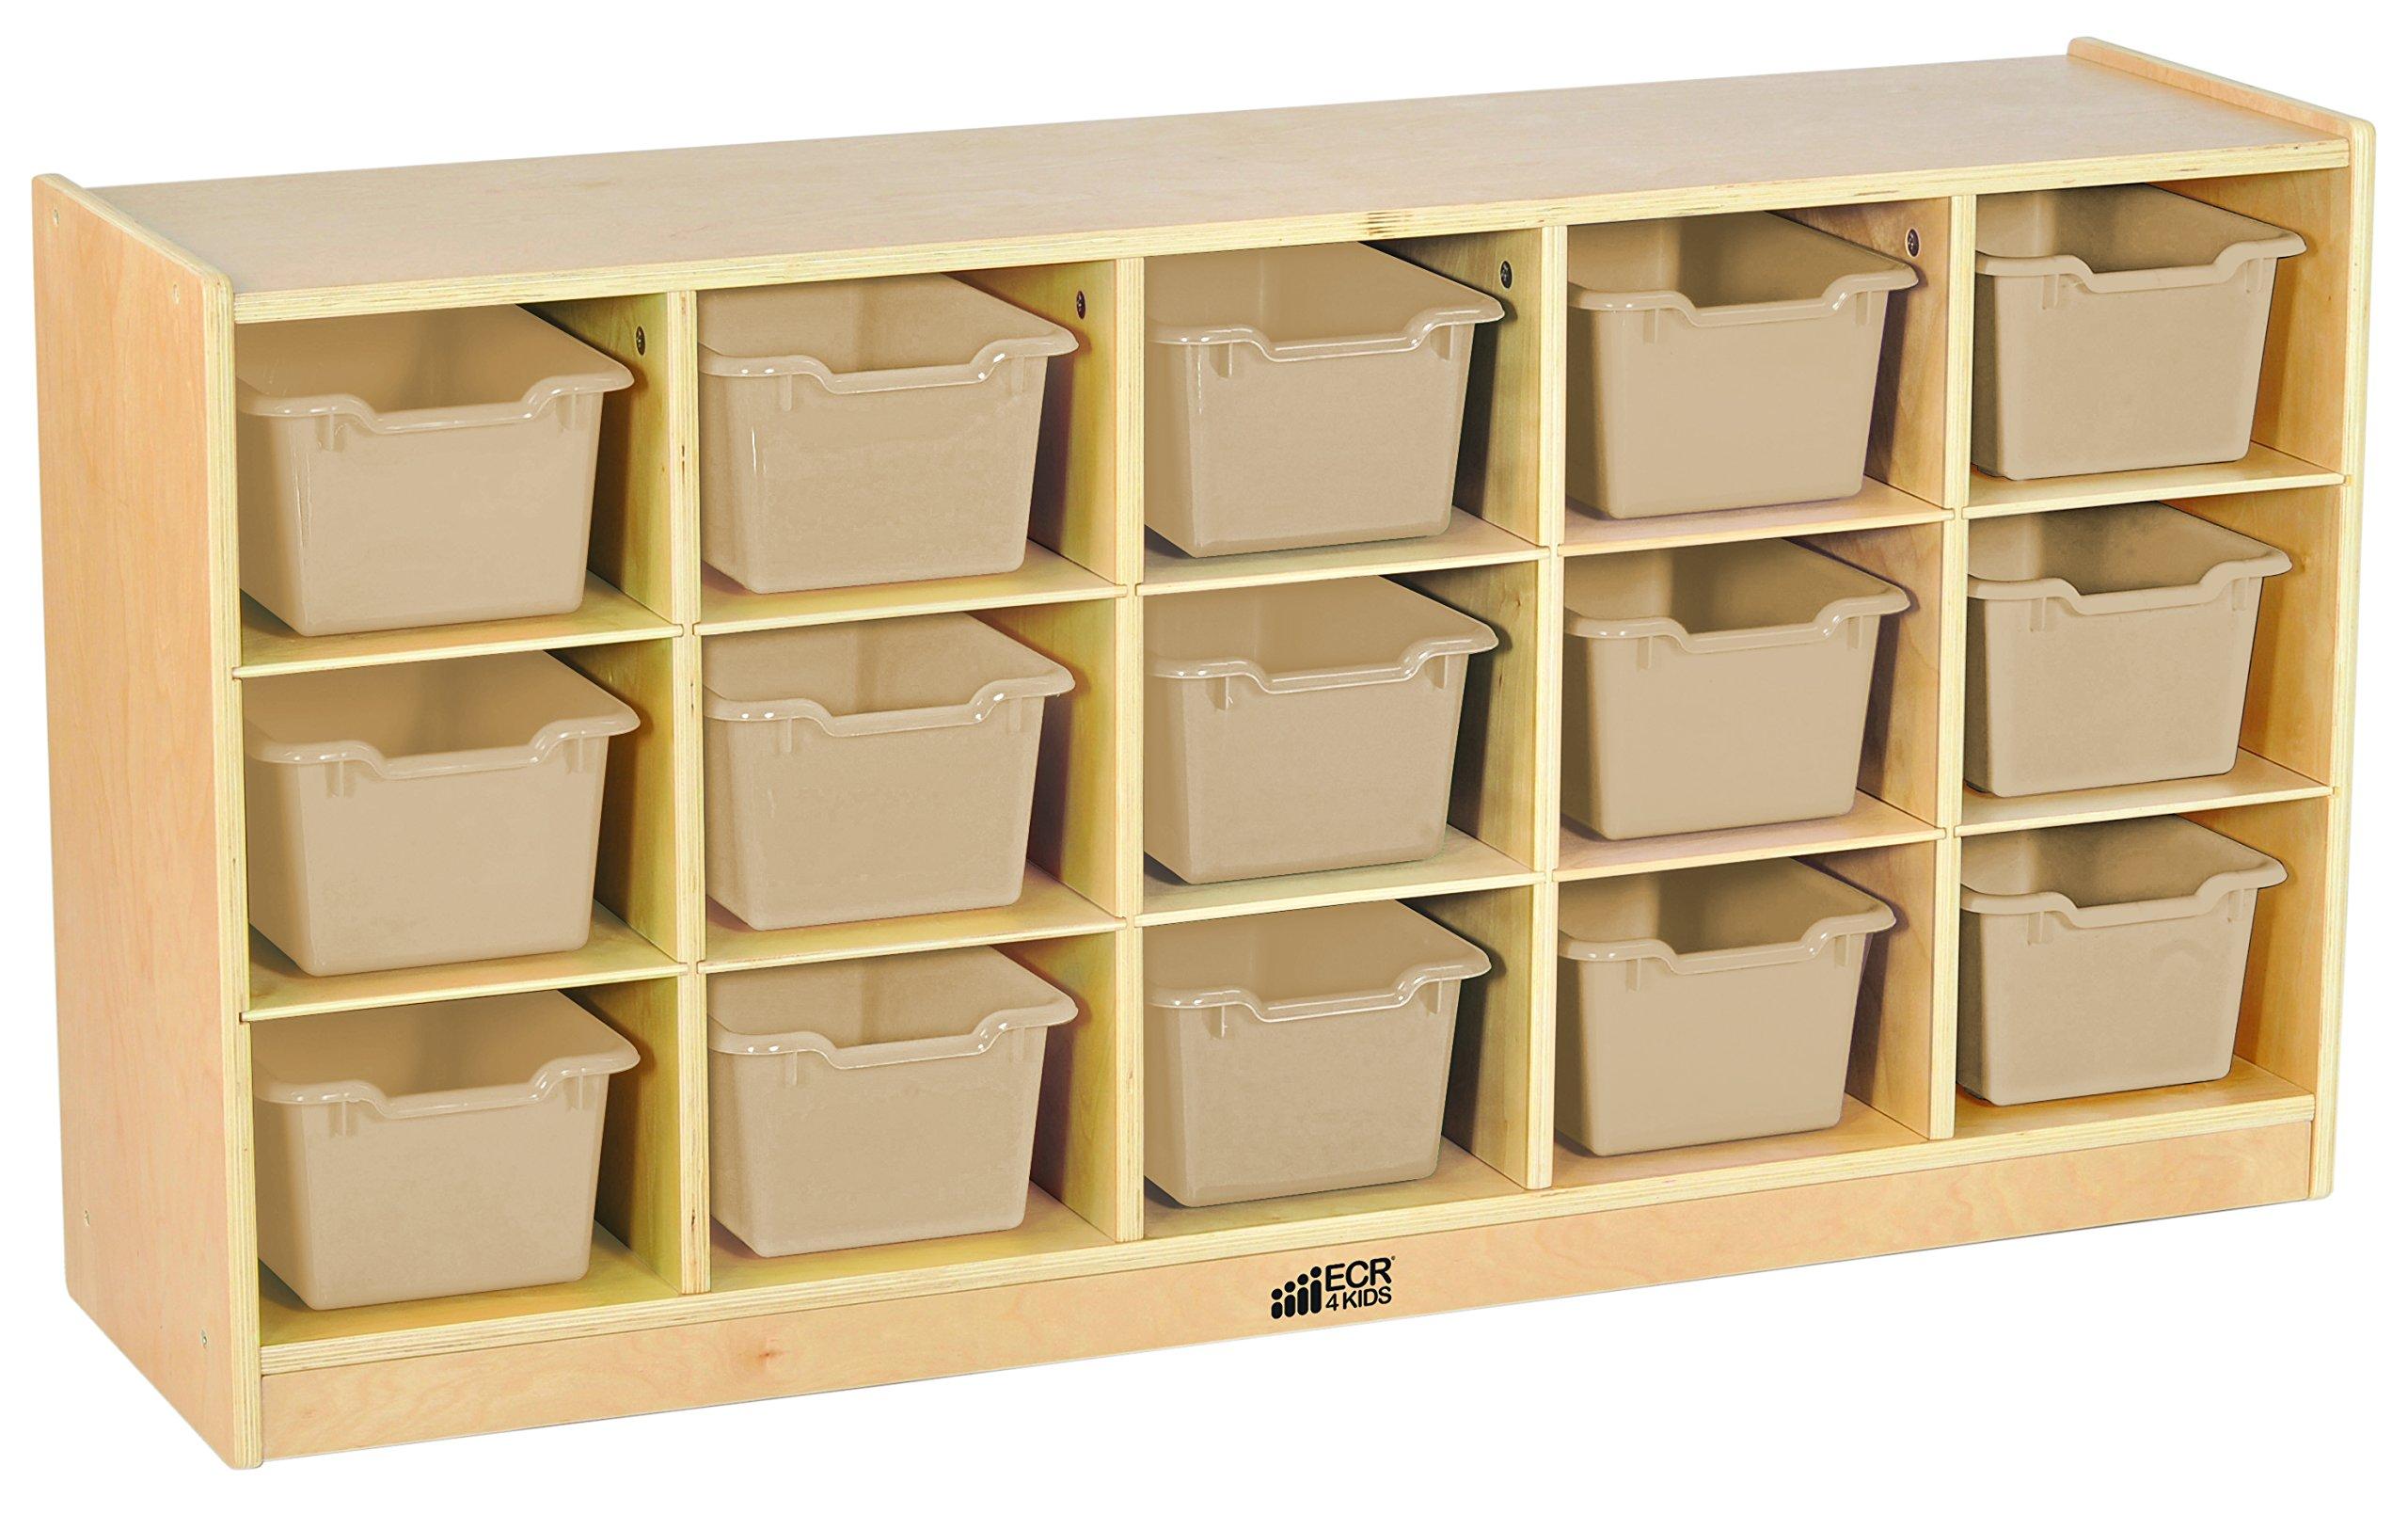 ECR4Kids Birch 15 Cubbie Tray Cabinet with Scoop Front Bins, Sand